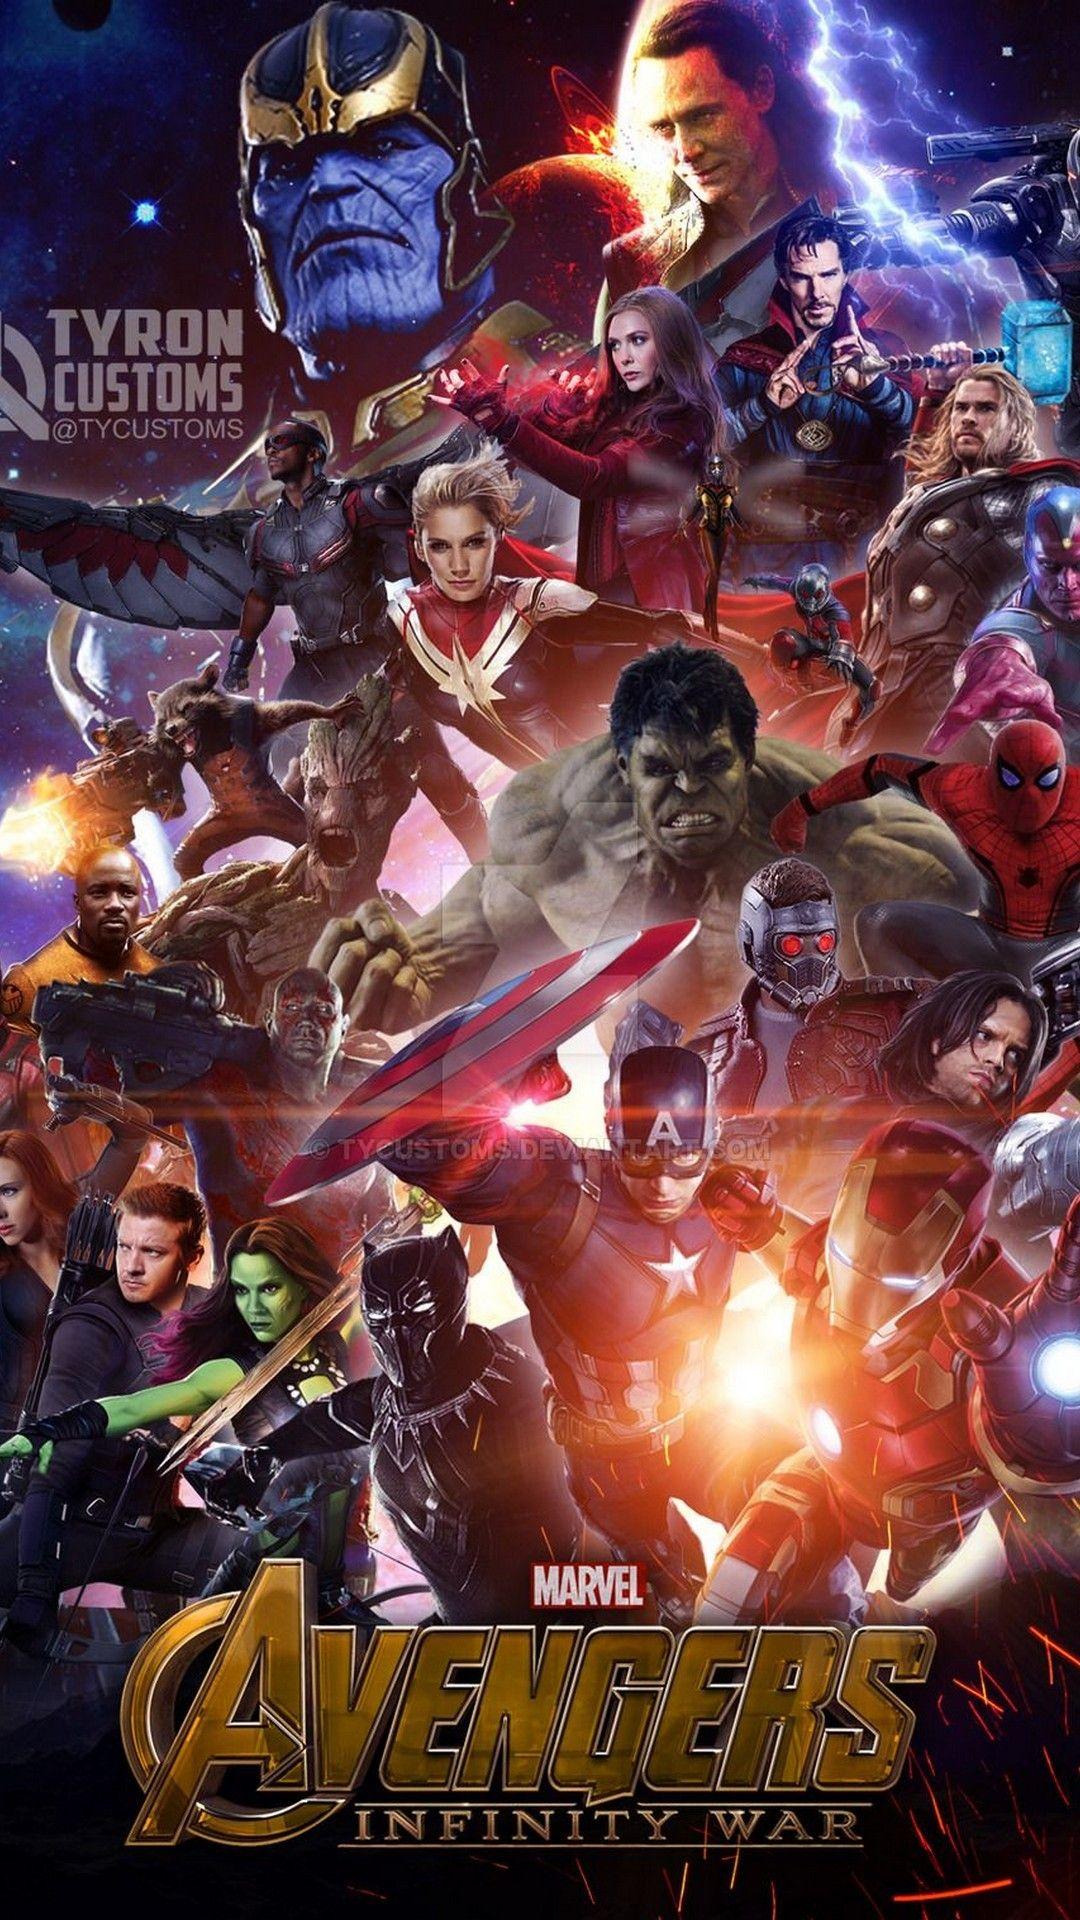 Wallpaper Avengers Infinity War Iphone Best Iphone Wallpaper Avengers Vs Thanos Avengers Marvel Avengers Funny